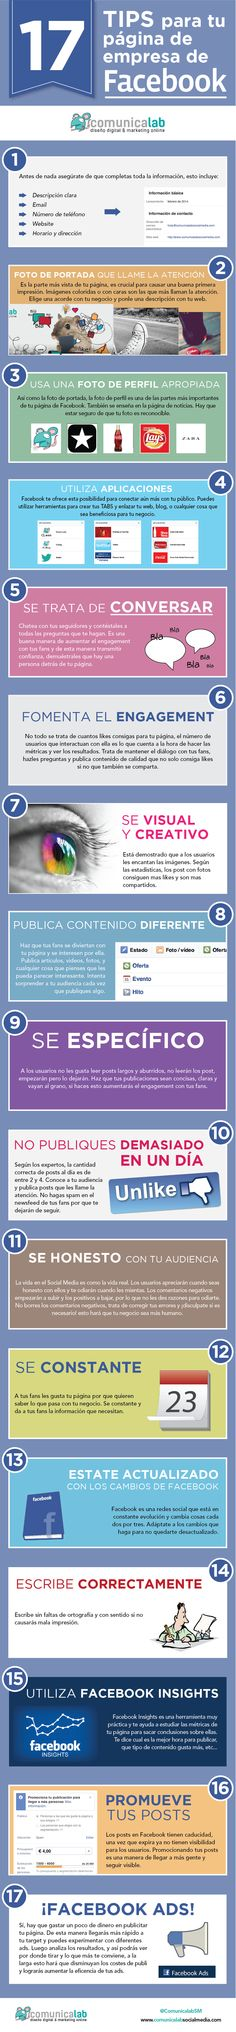 17 tips para tu página de empresa de #Facebook. #SocialMedia #MarketingOnline #RedesSociales #Infografia #Infografics